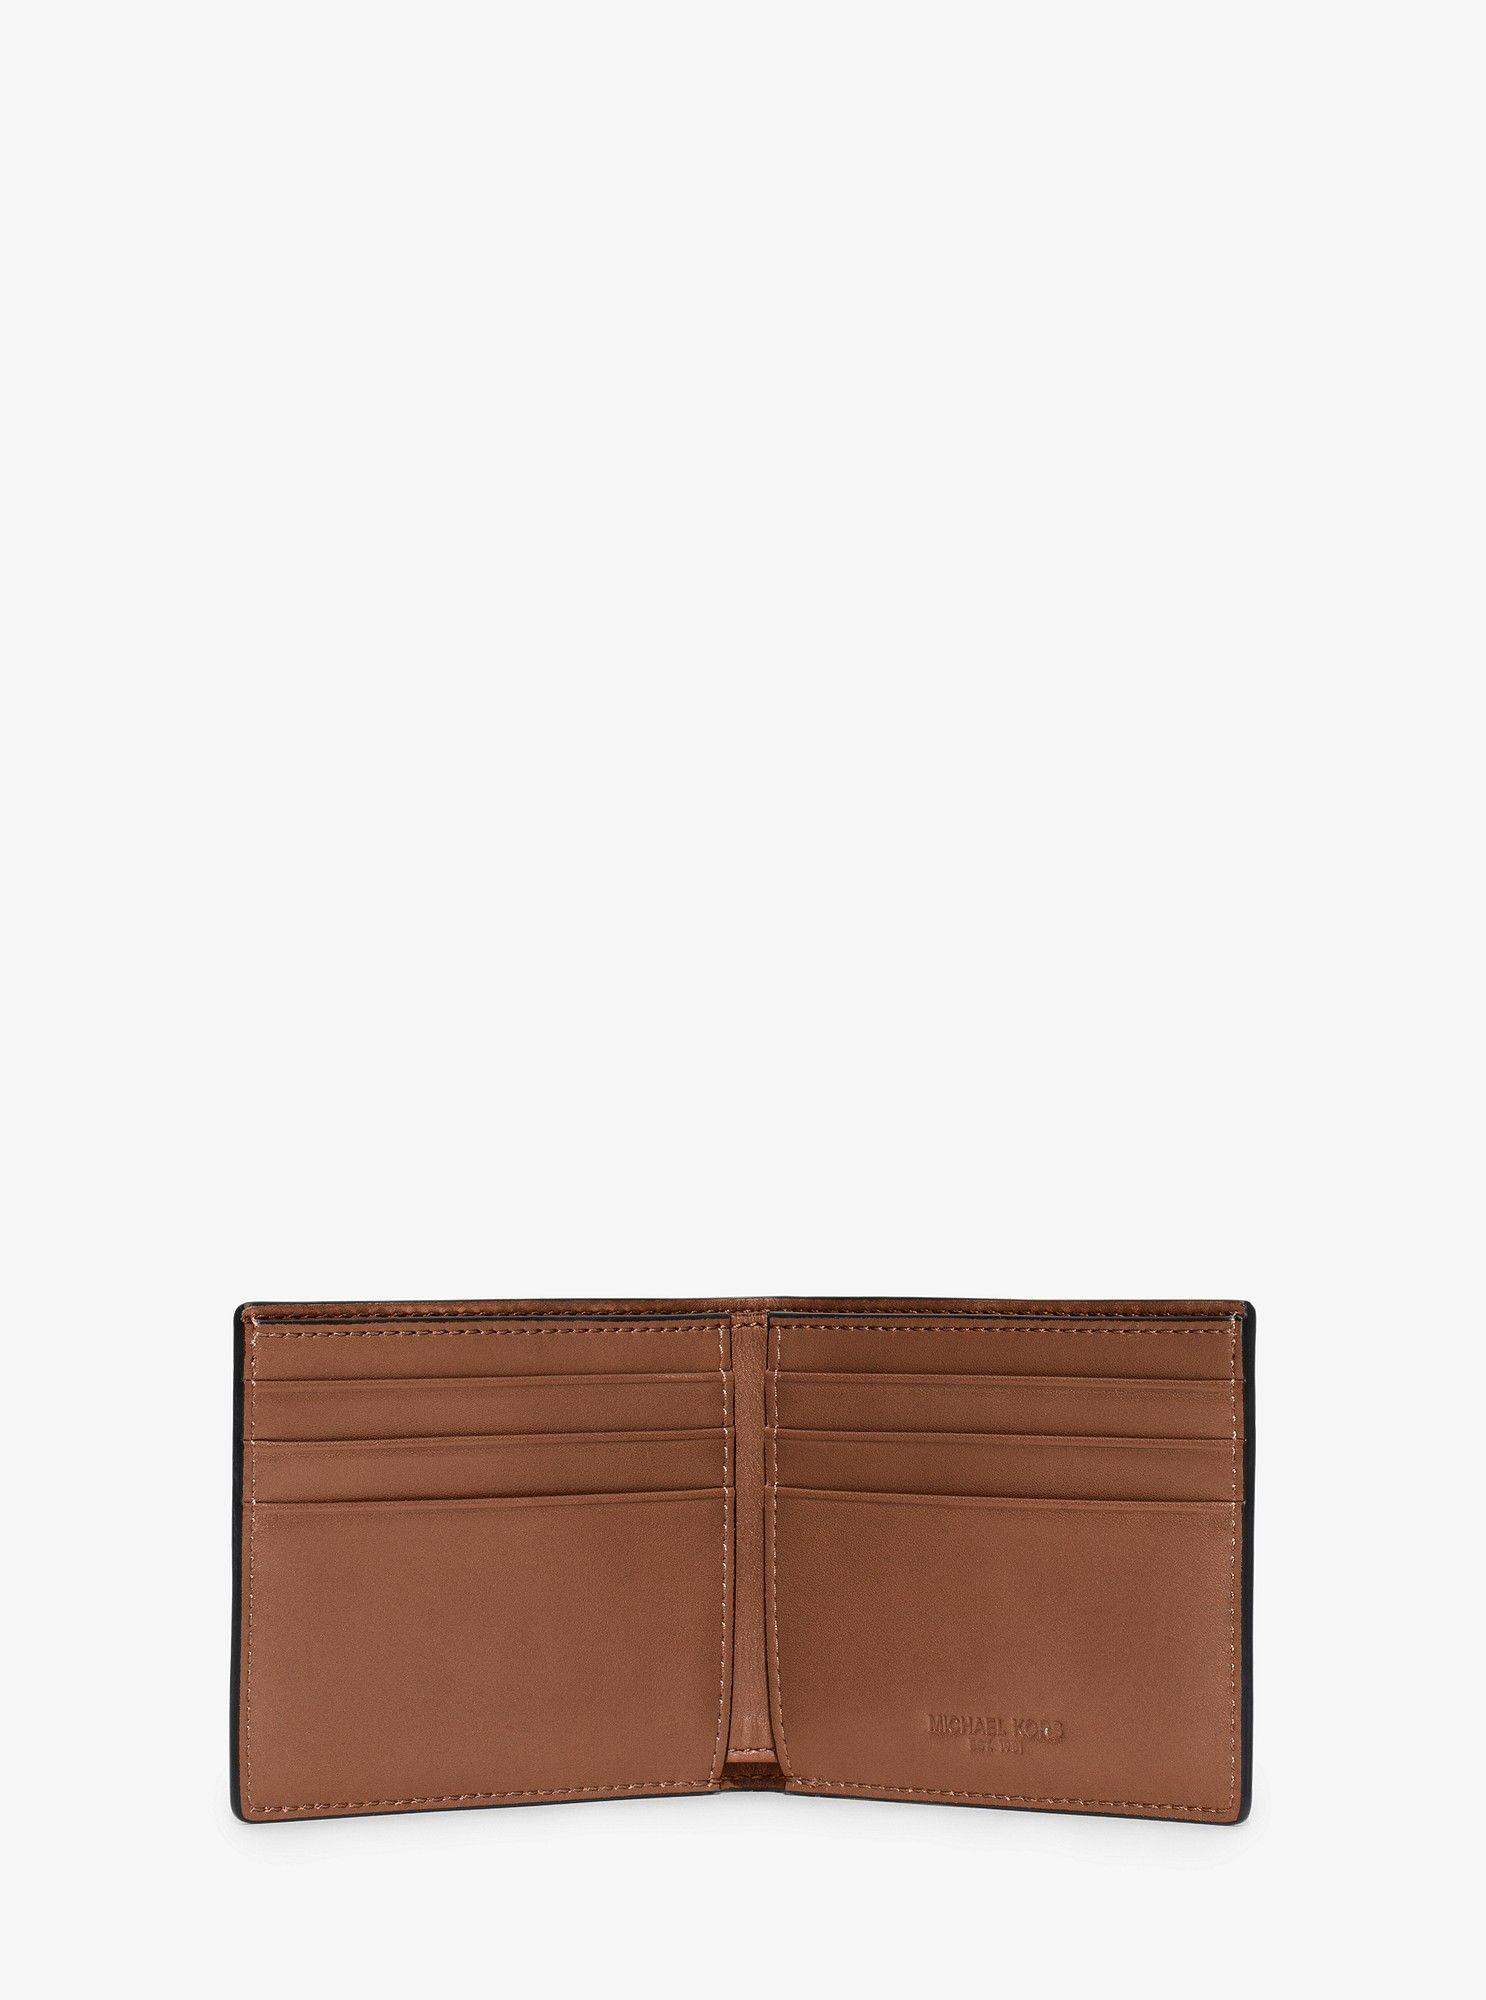 50d77871f537 Michael Kors Harrison Slim Leather Billfold Wallet - Brightorange